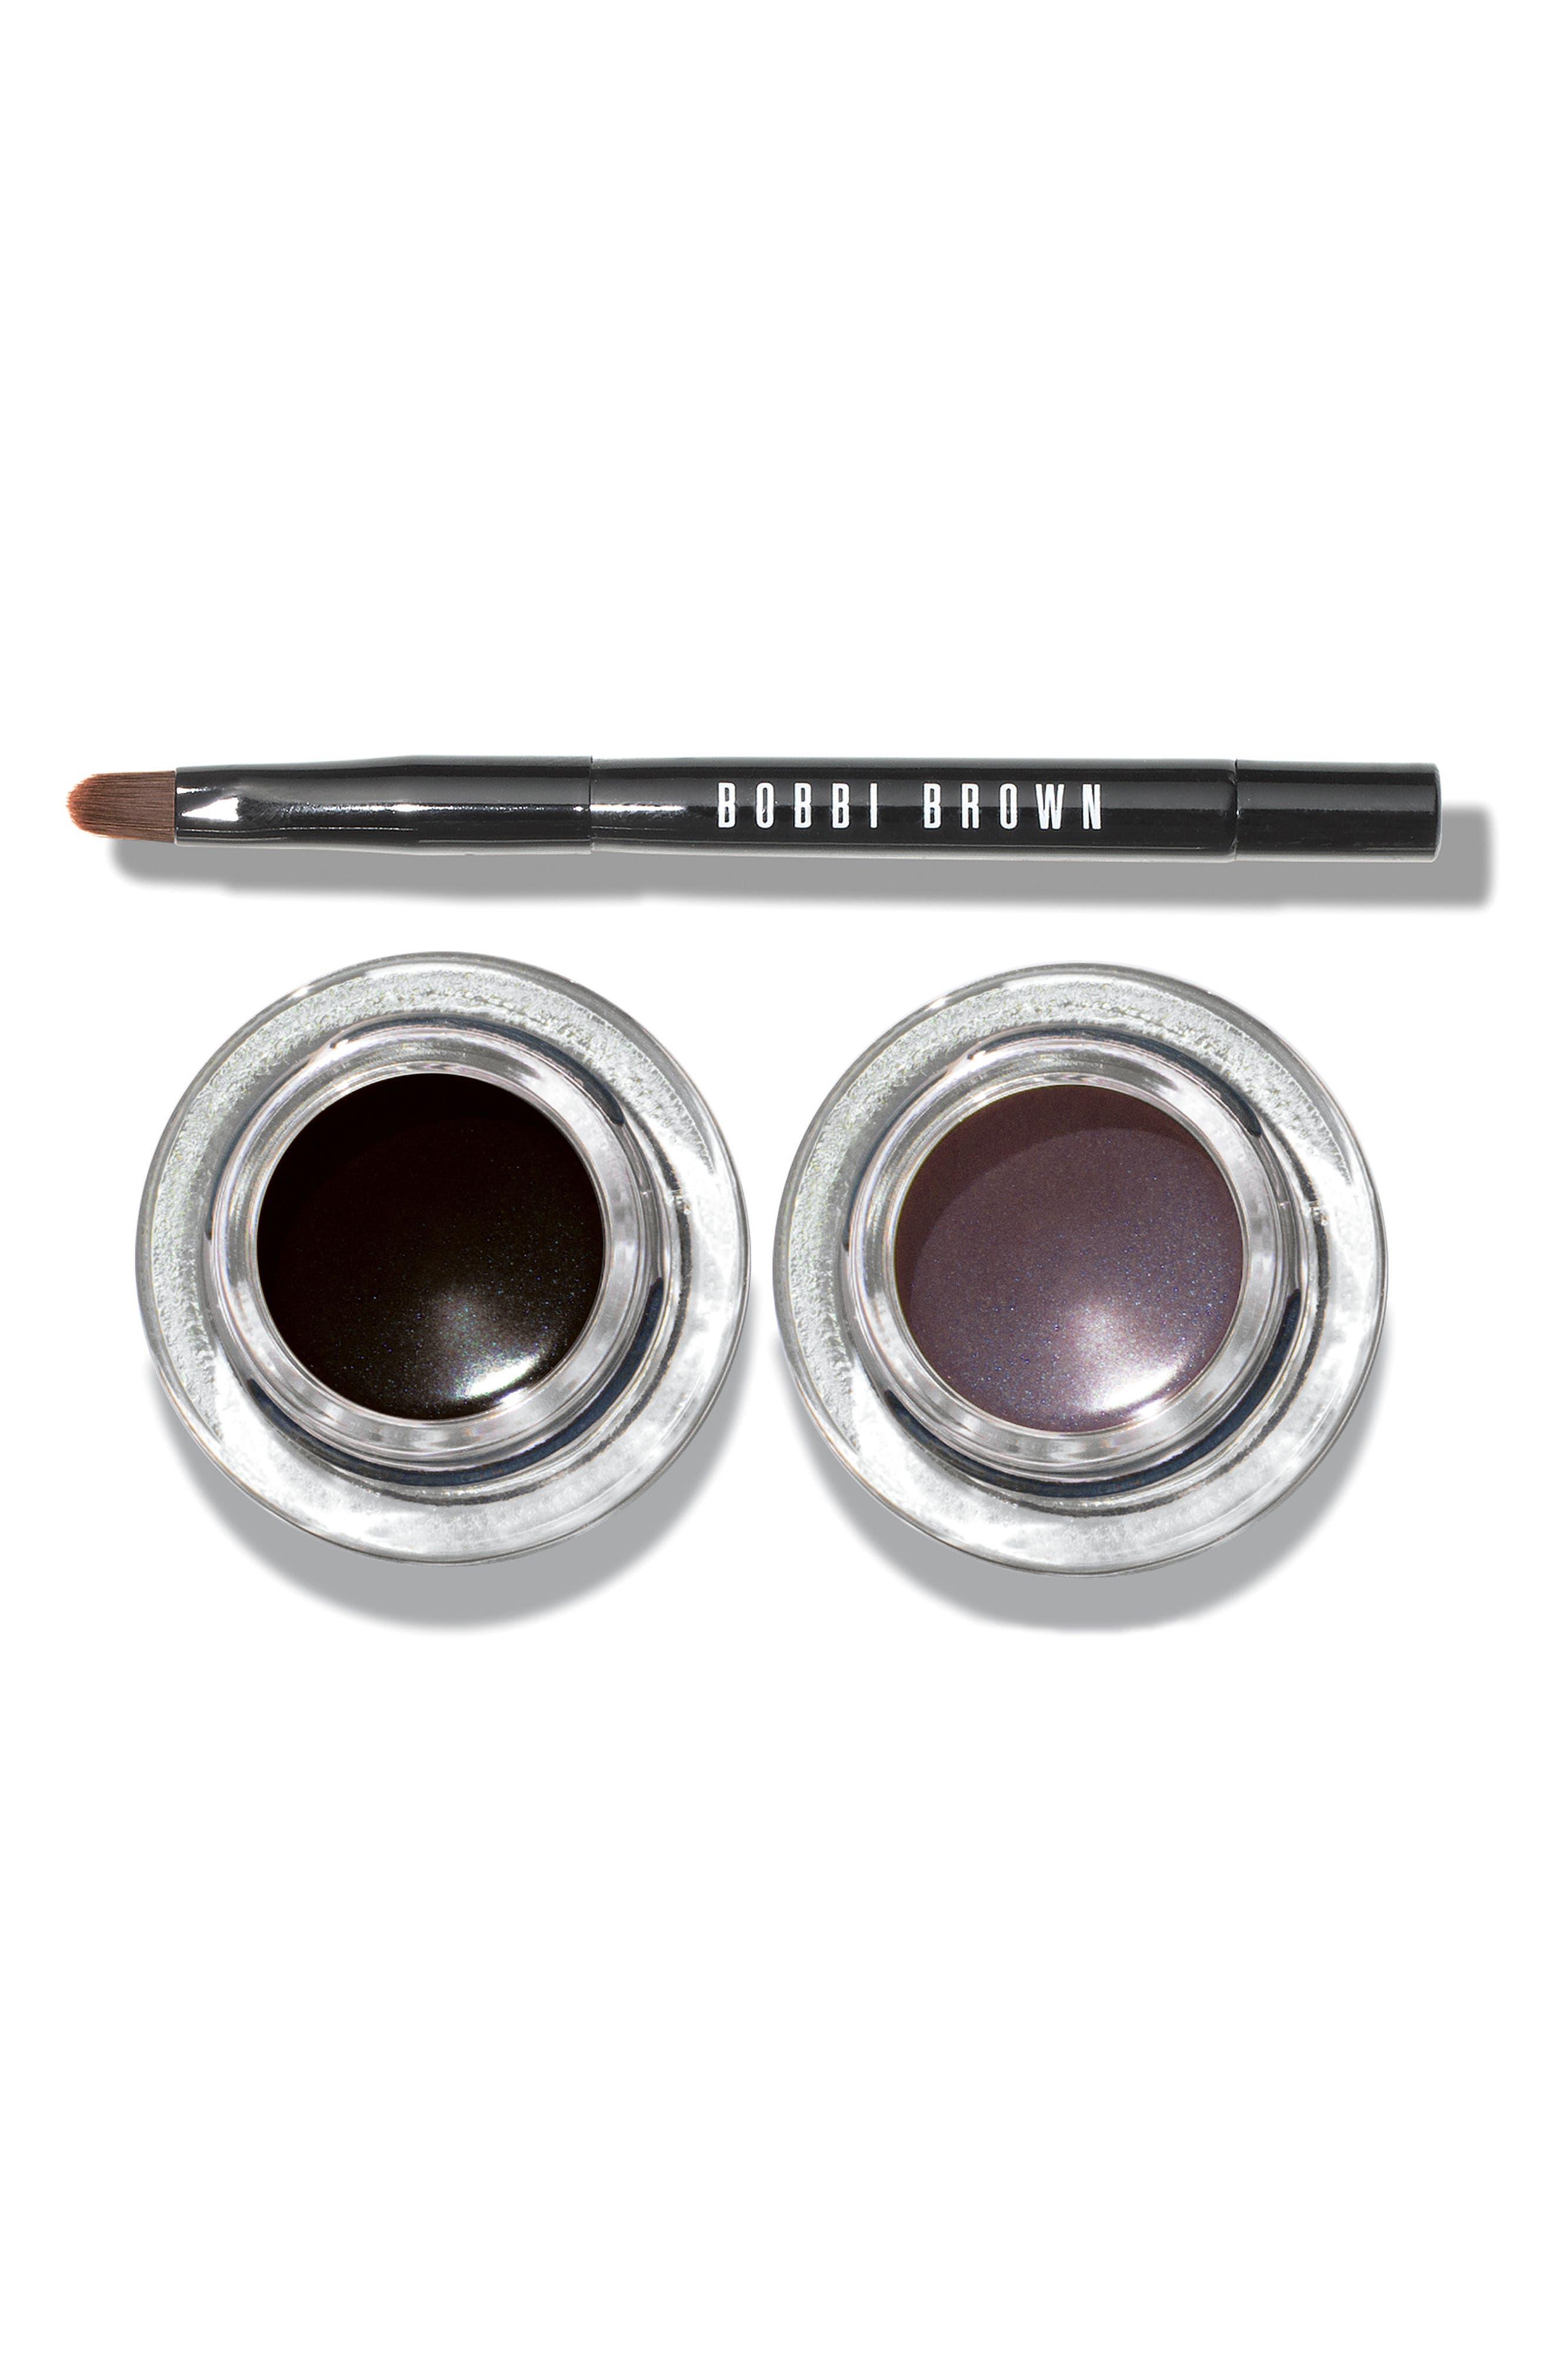 Cat-Eye Long-Wear Gel Eyeliner & Brush Set,                             Main thumbnail 1, color,                             000